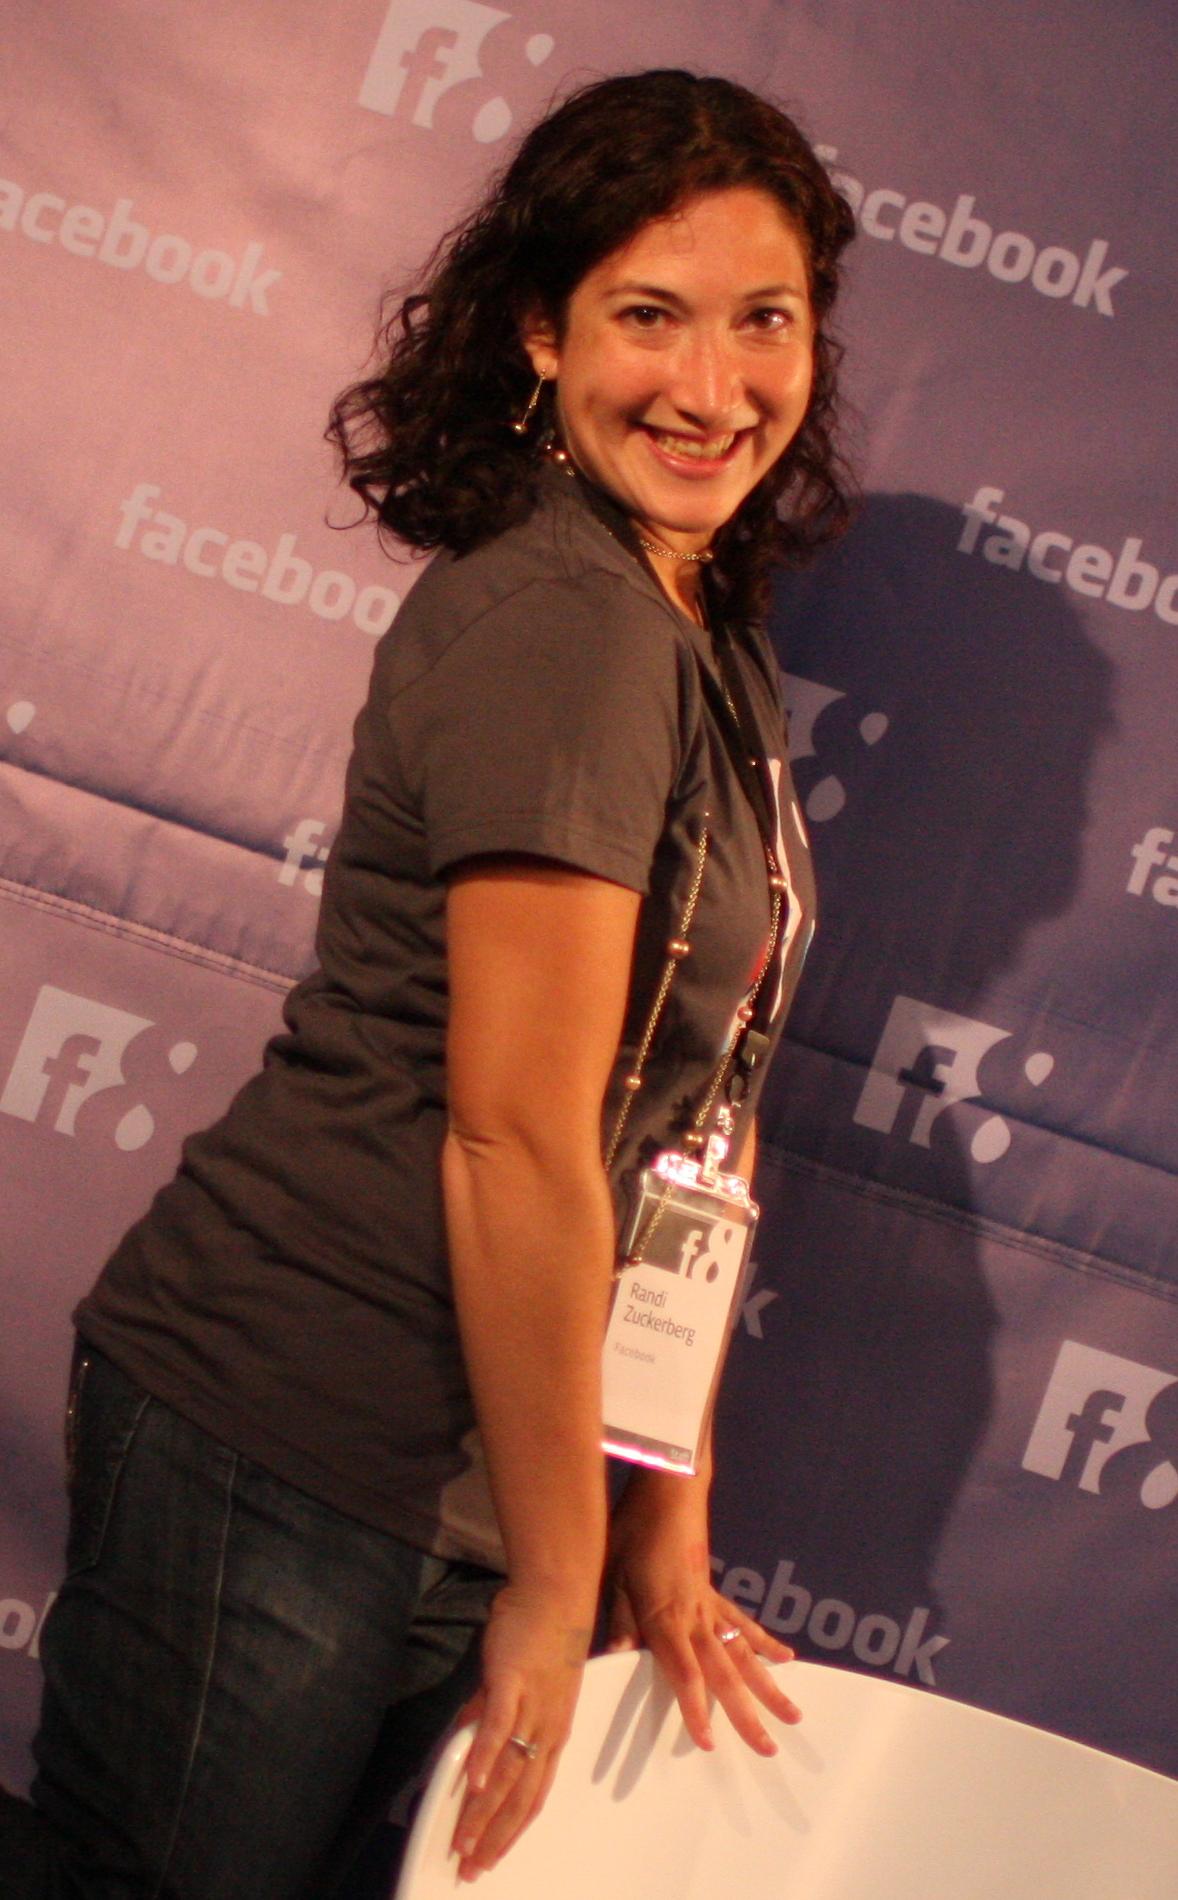 Randi Zuckerberg Pics >> File:Randi Zuckerberg f808.jpg